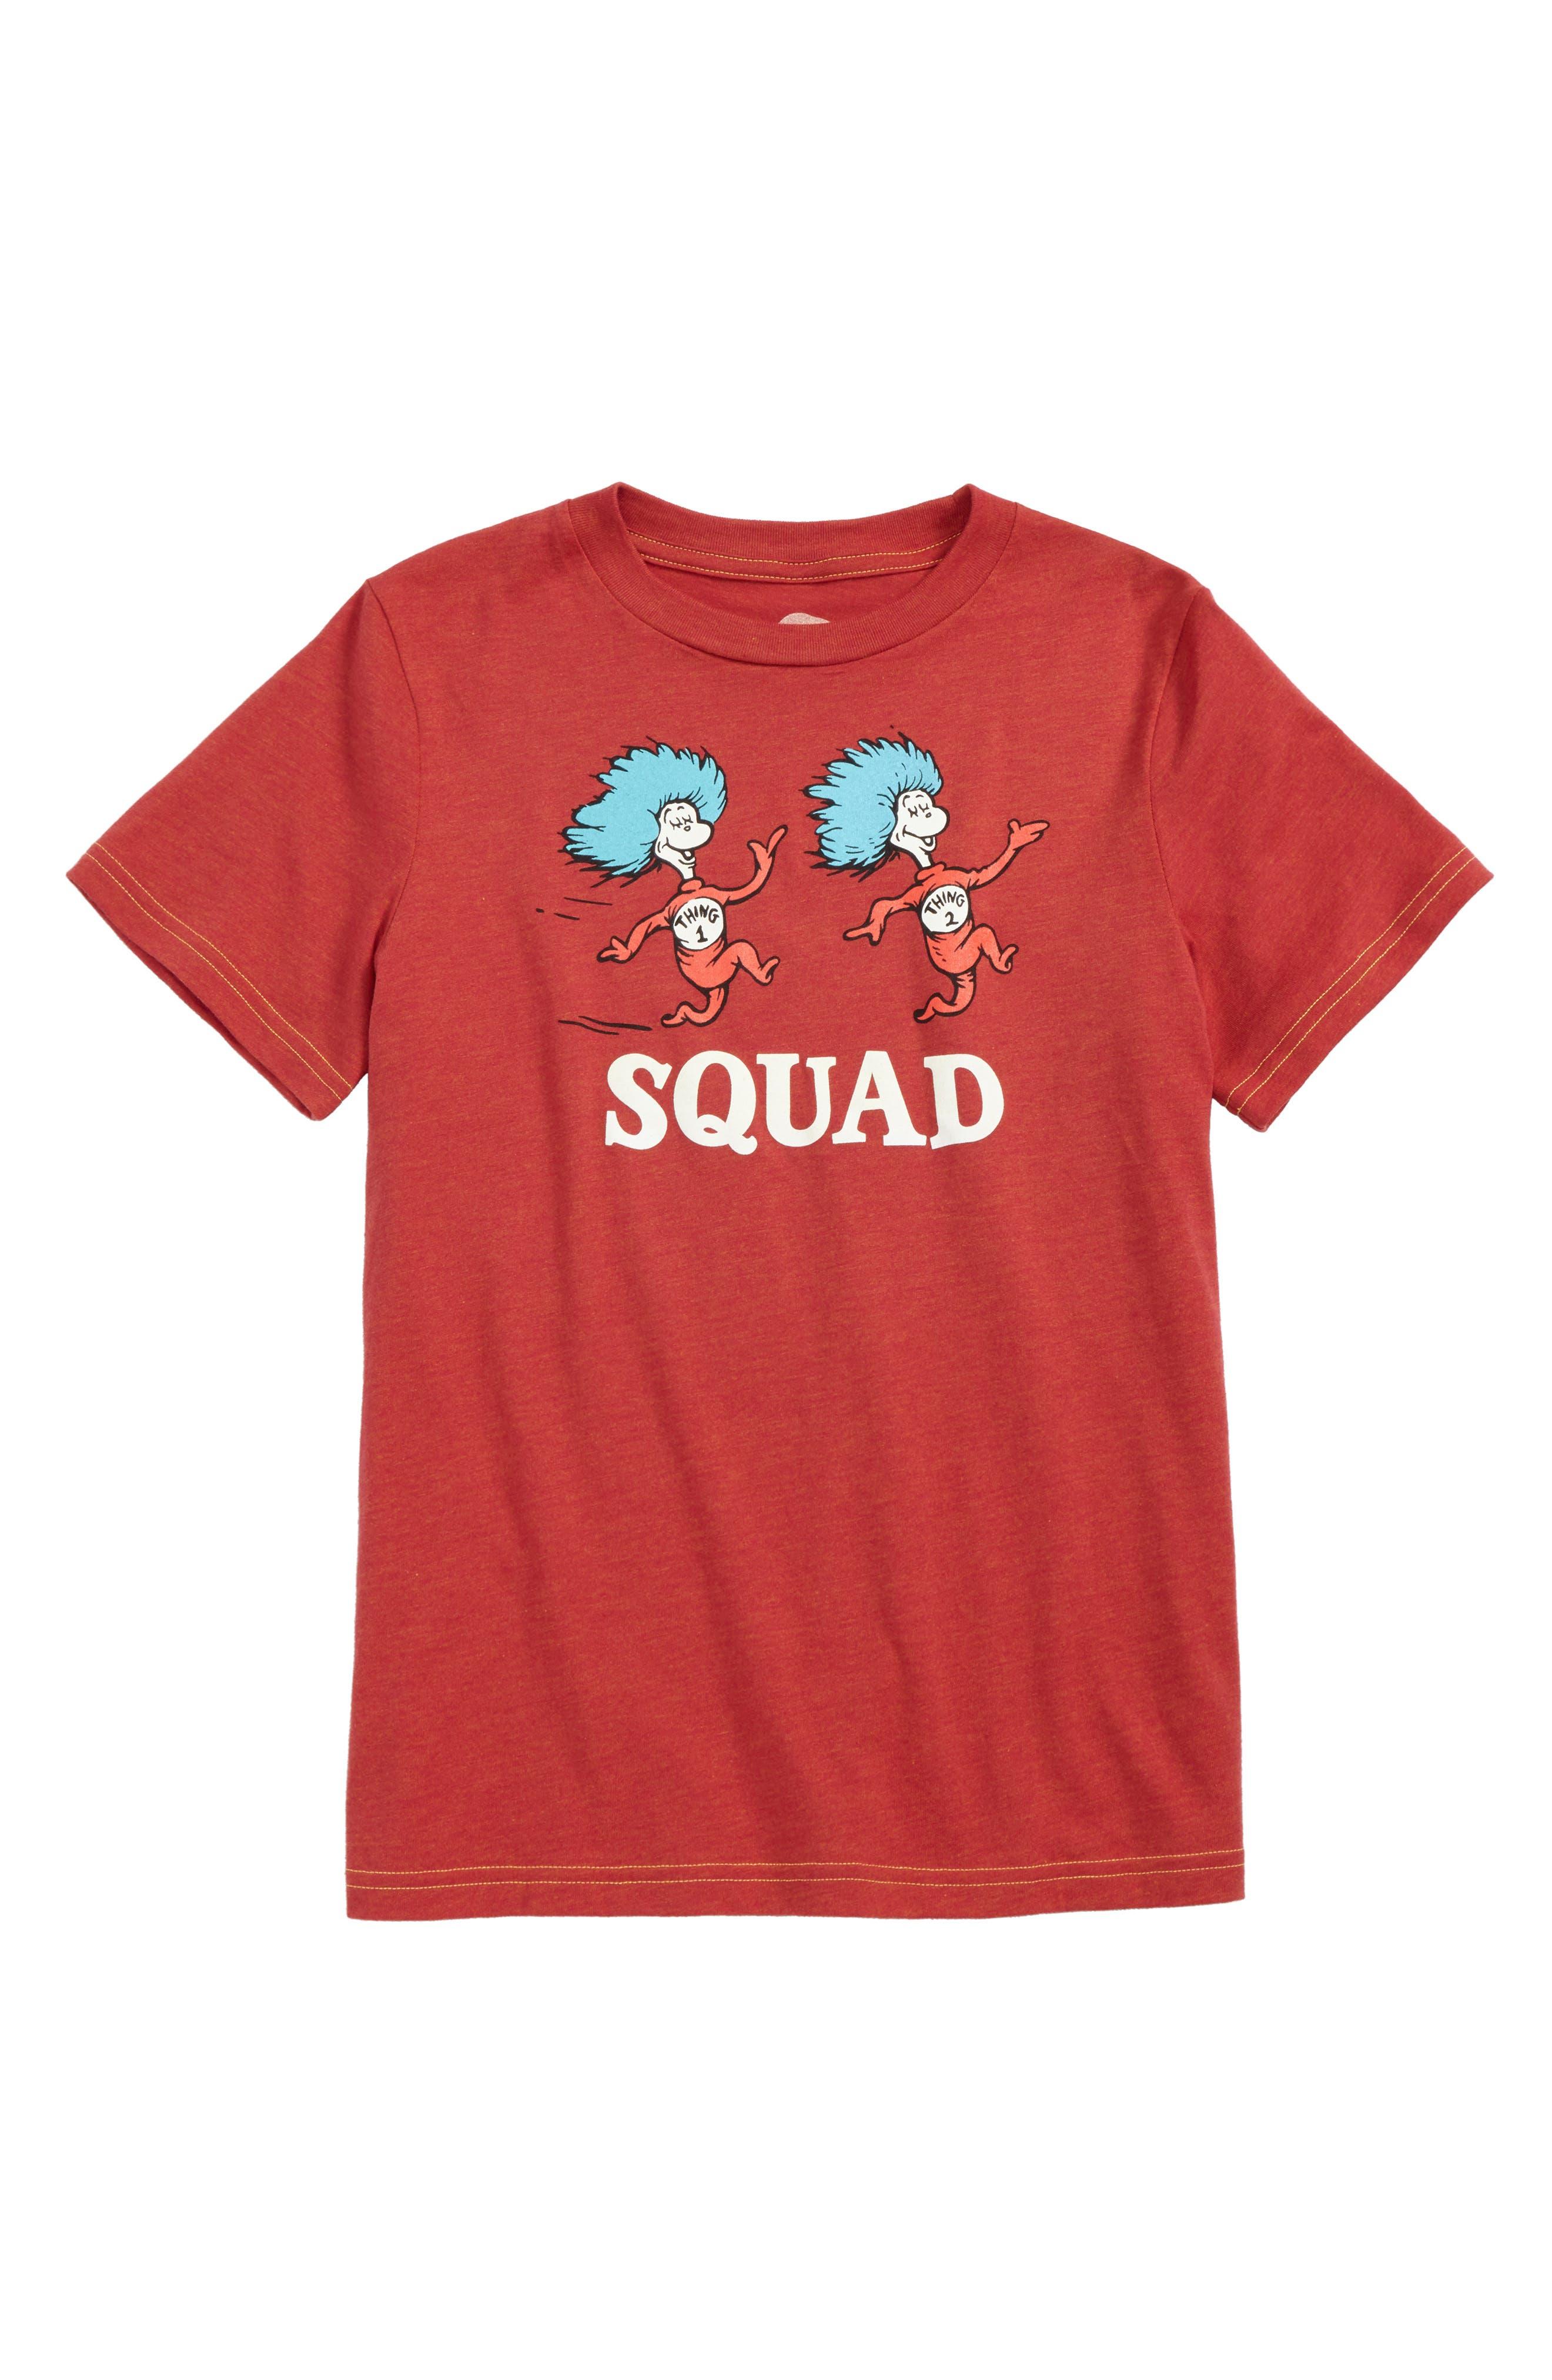 Main Image - Jem Dr. Seuss Squad Graphic T-Shirt (Big Boys)